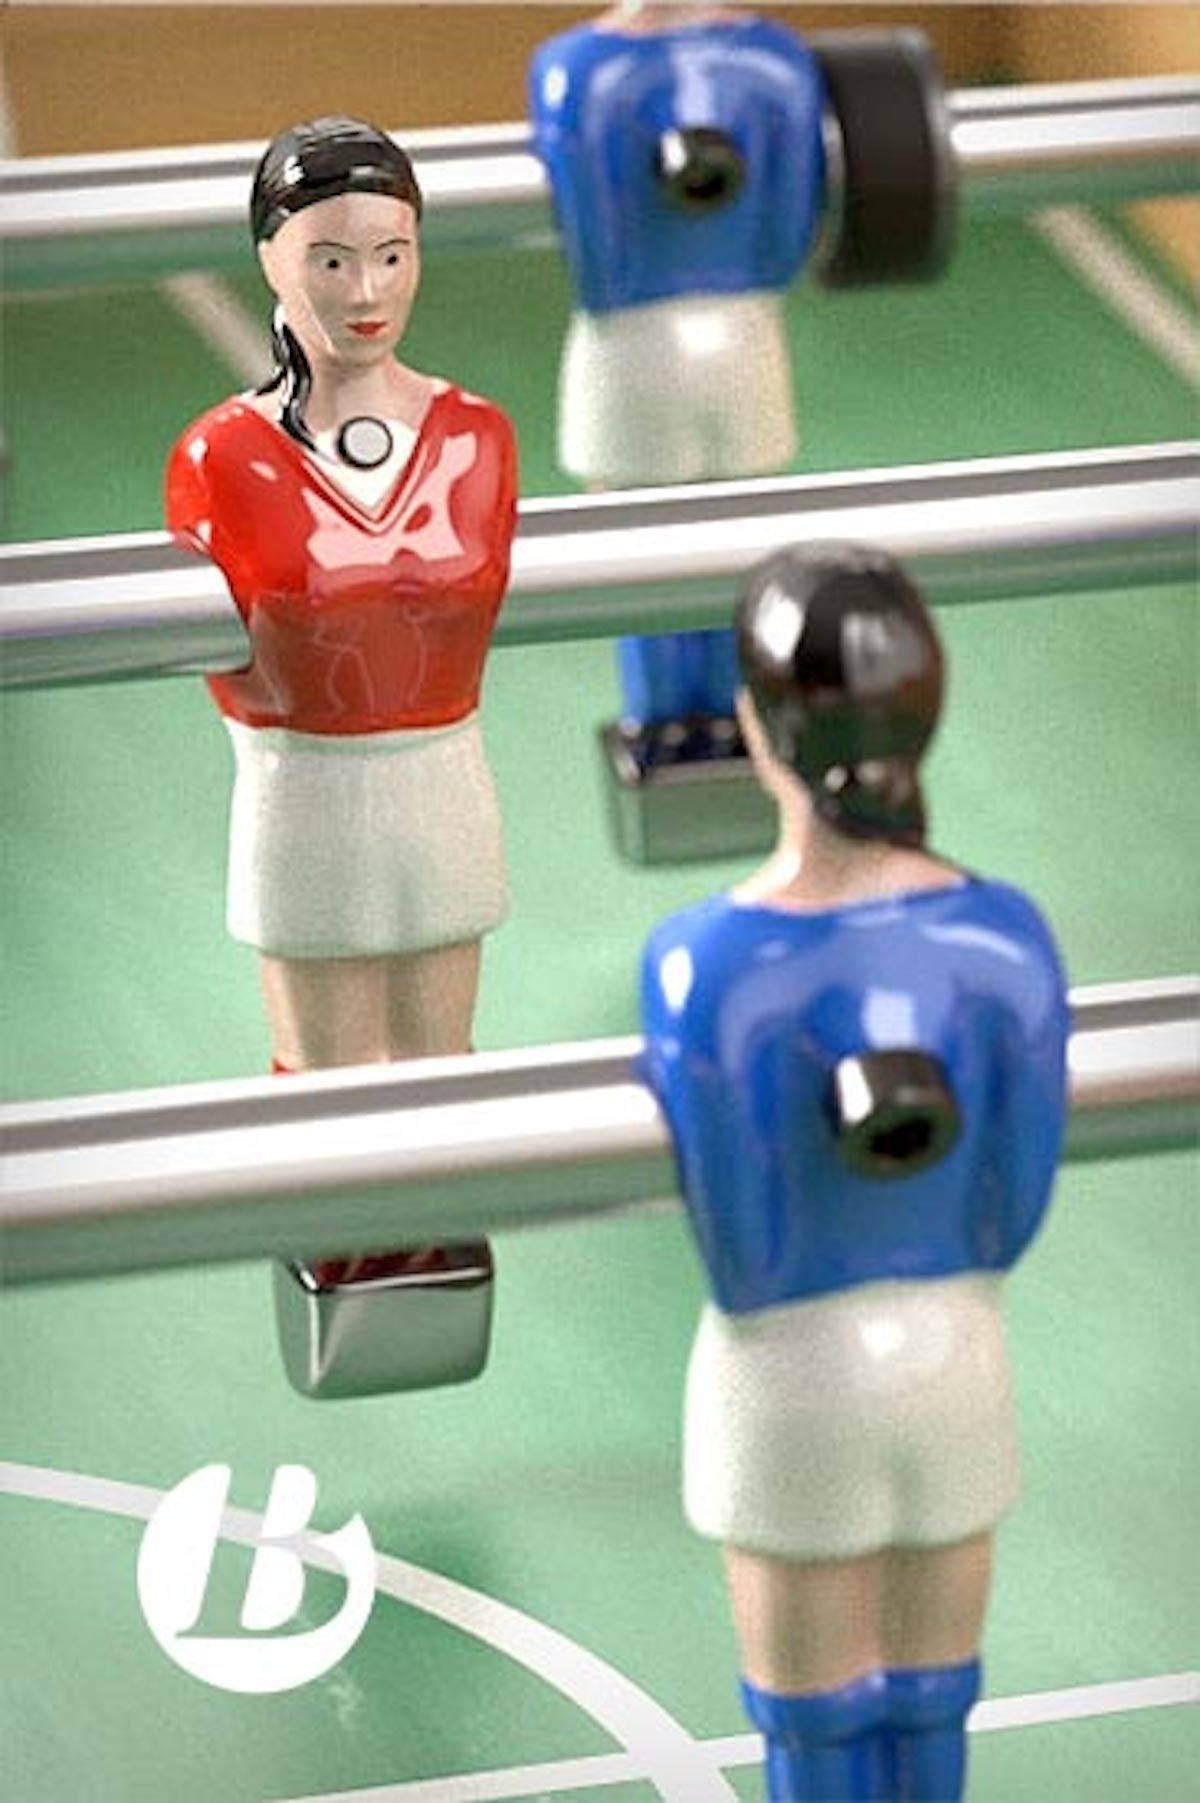 Baby-foot mixte figurines féminines